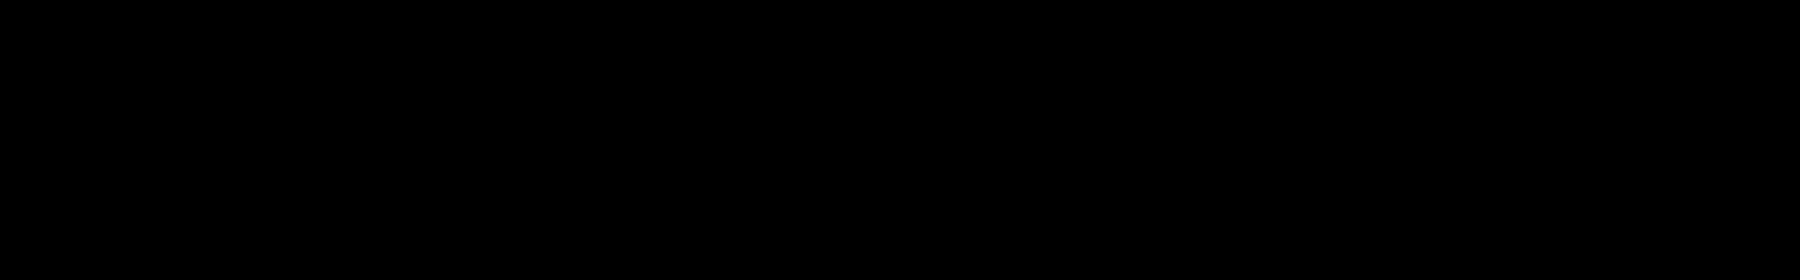 Unmüte Cinematix Vol 1 audio waveform